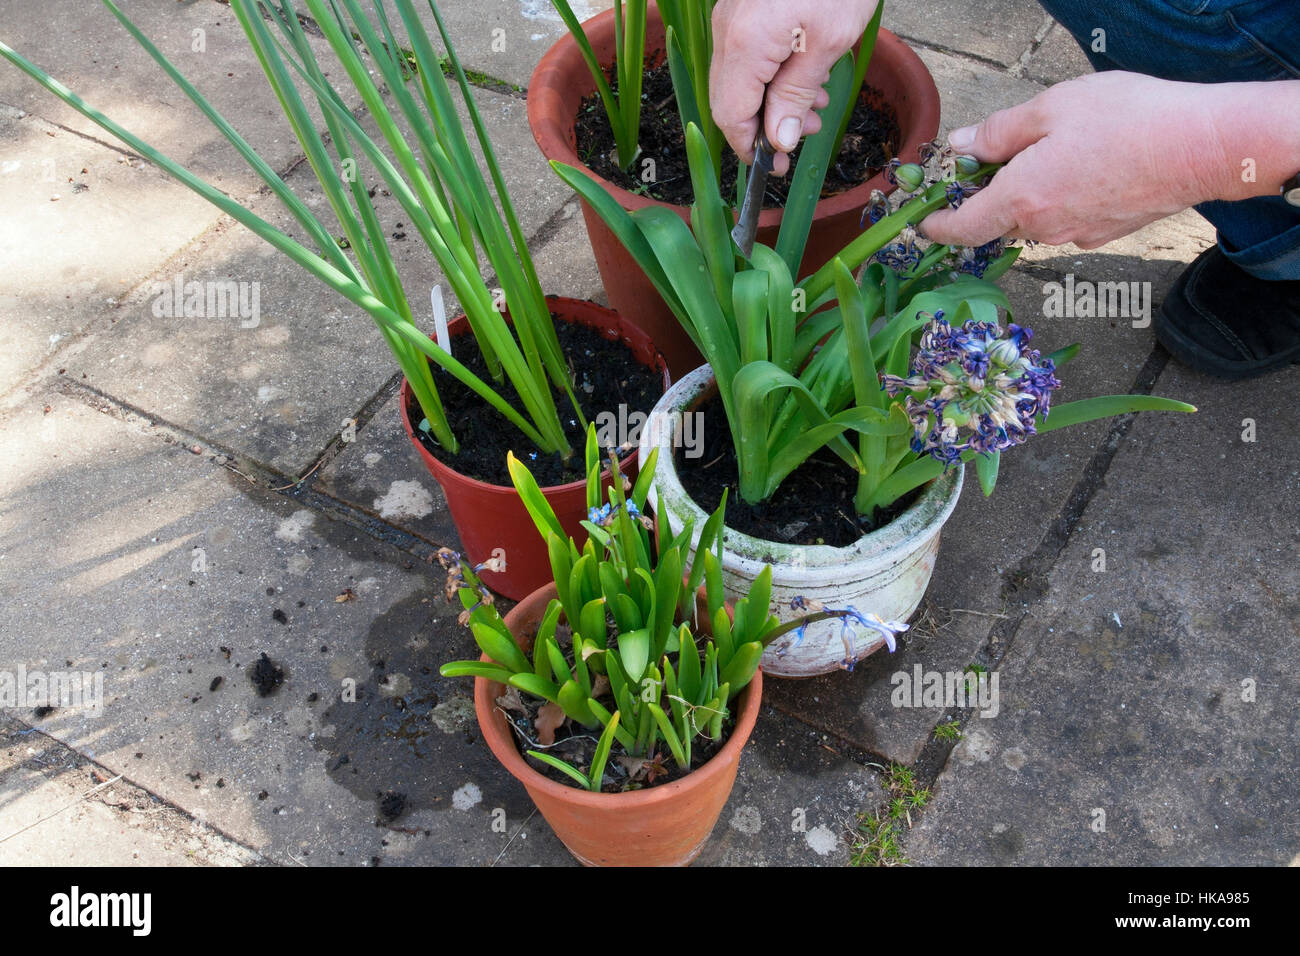 Dead-heading spring flowering bulbs - Stock Image